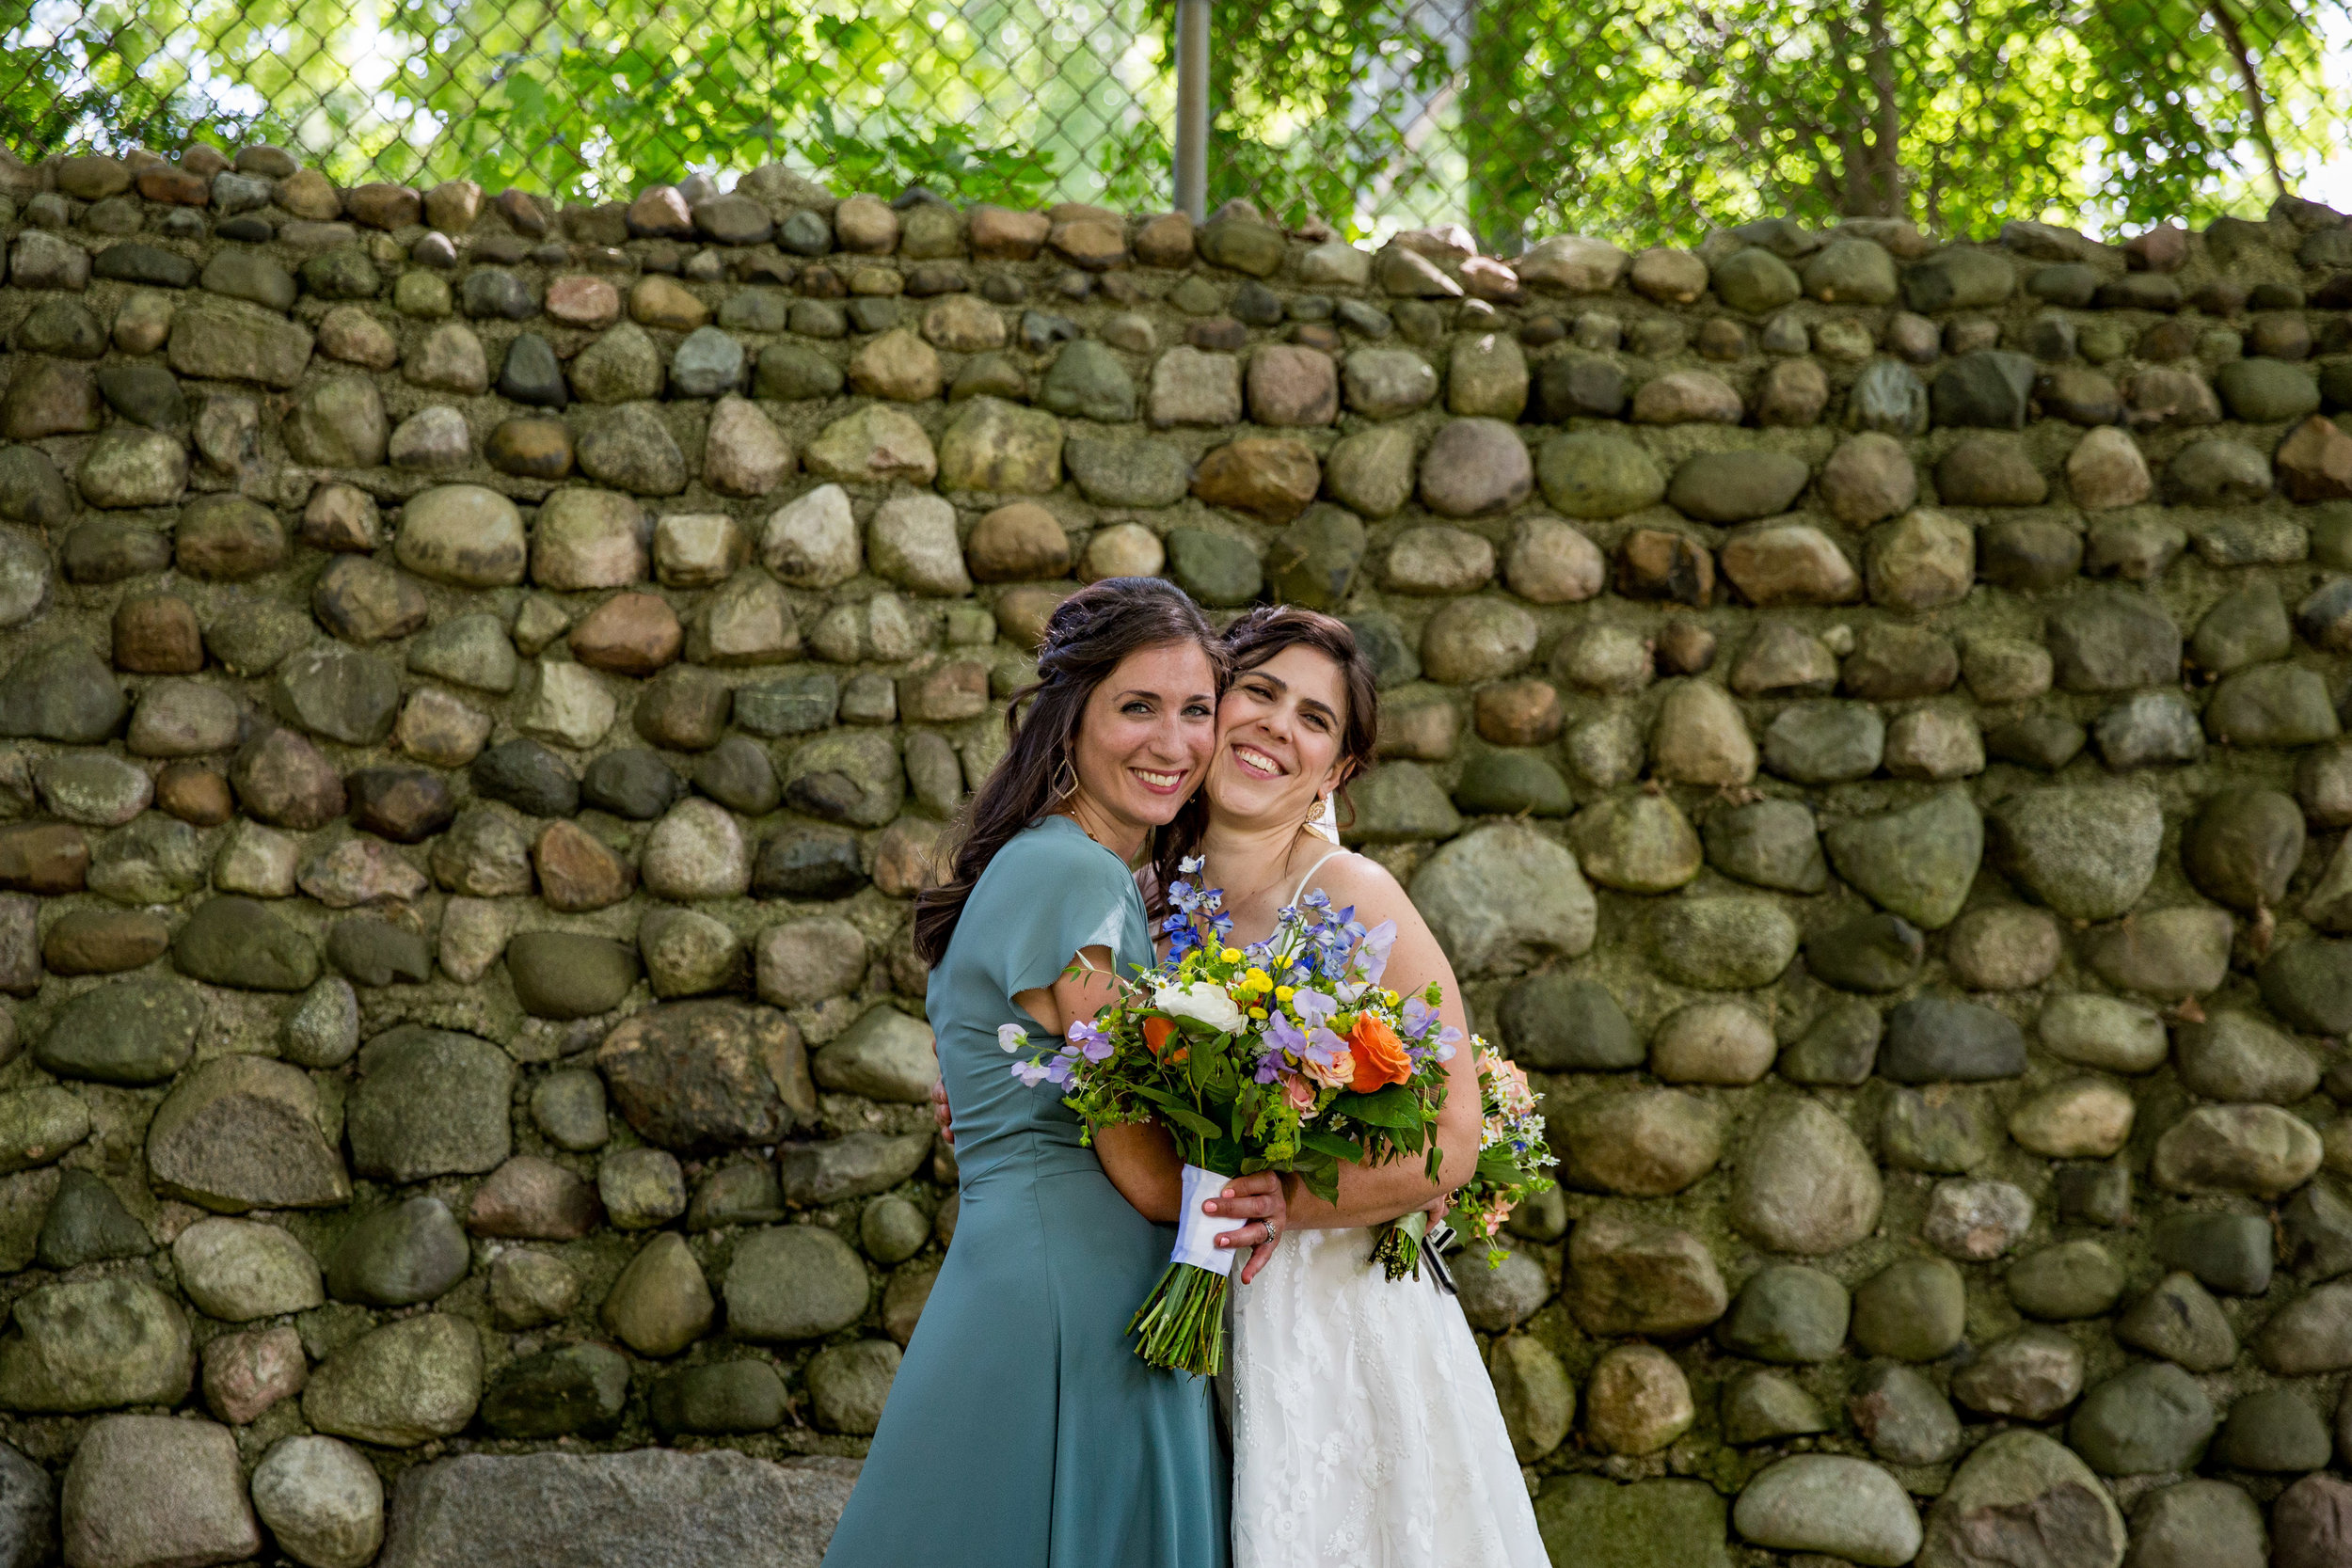 Natalie and Dallas Mooney Wedding 6-8-19_Tania Watt Photography-342.jpg